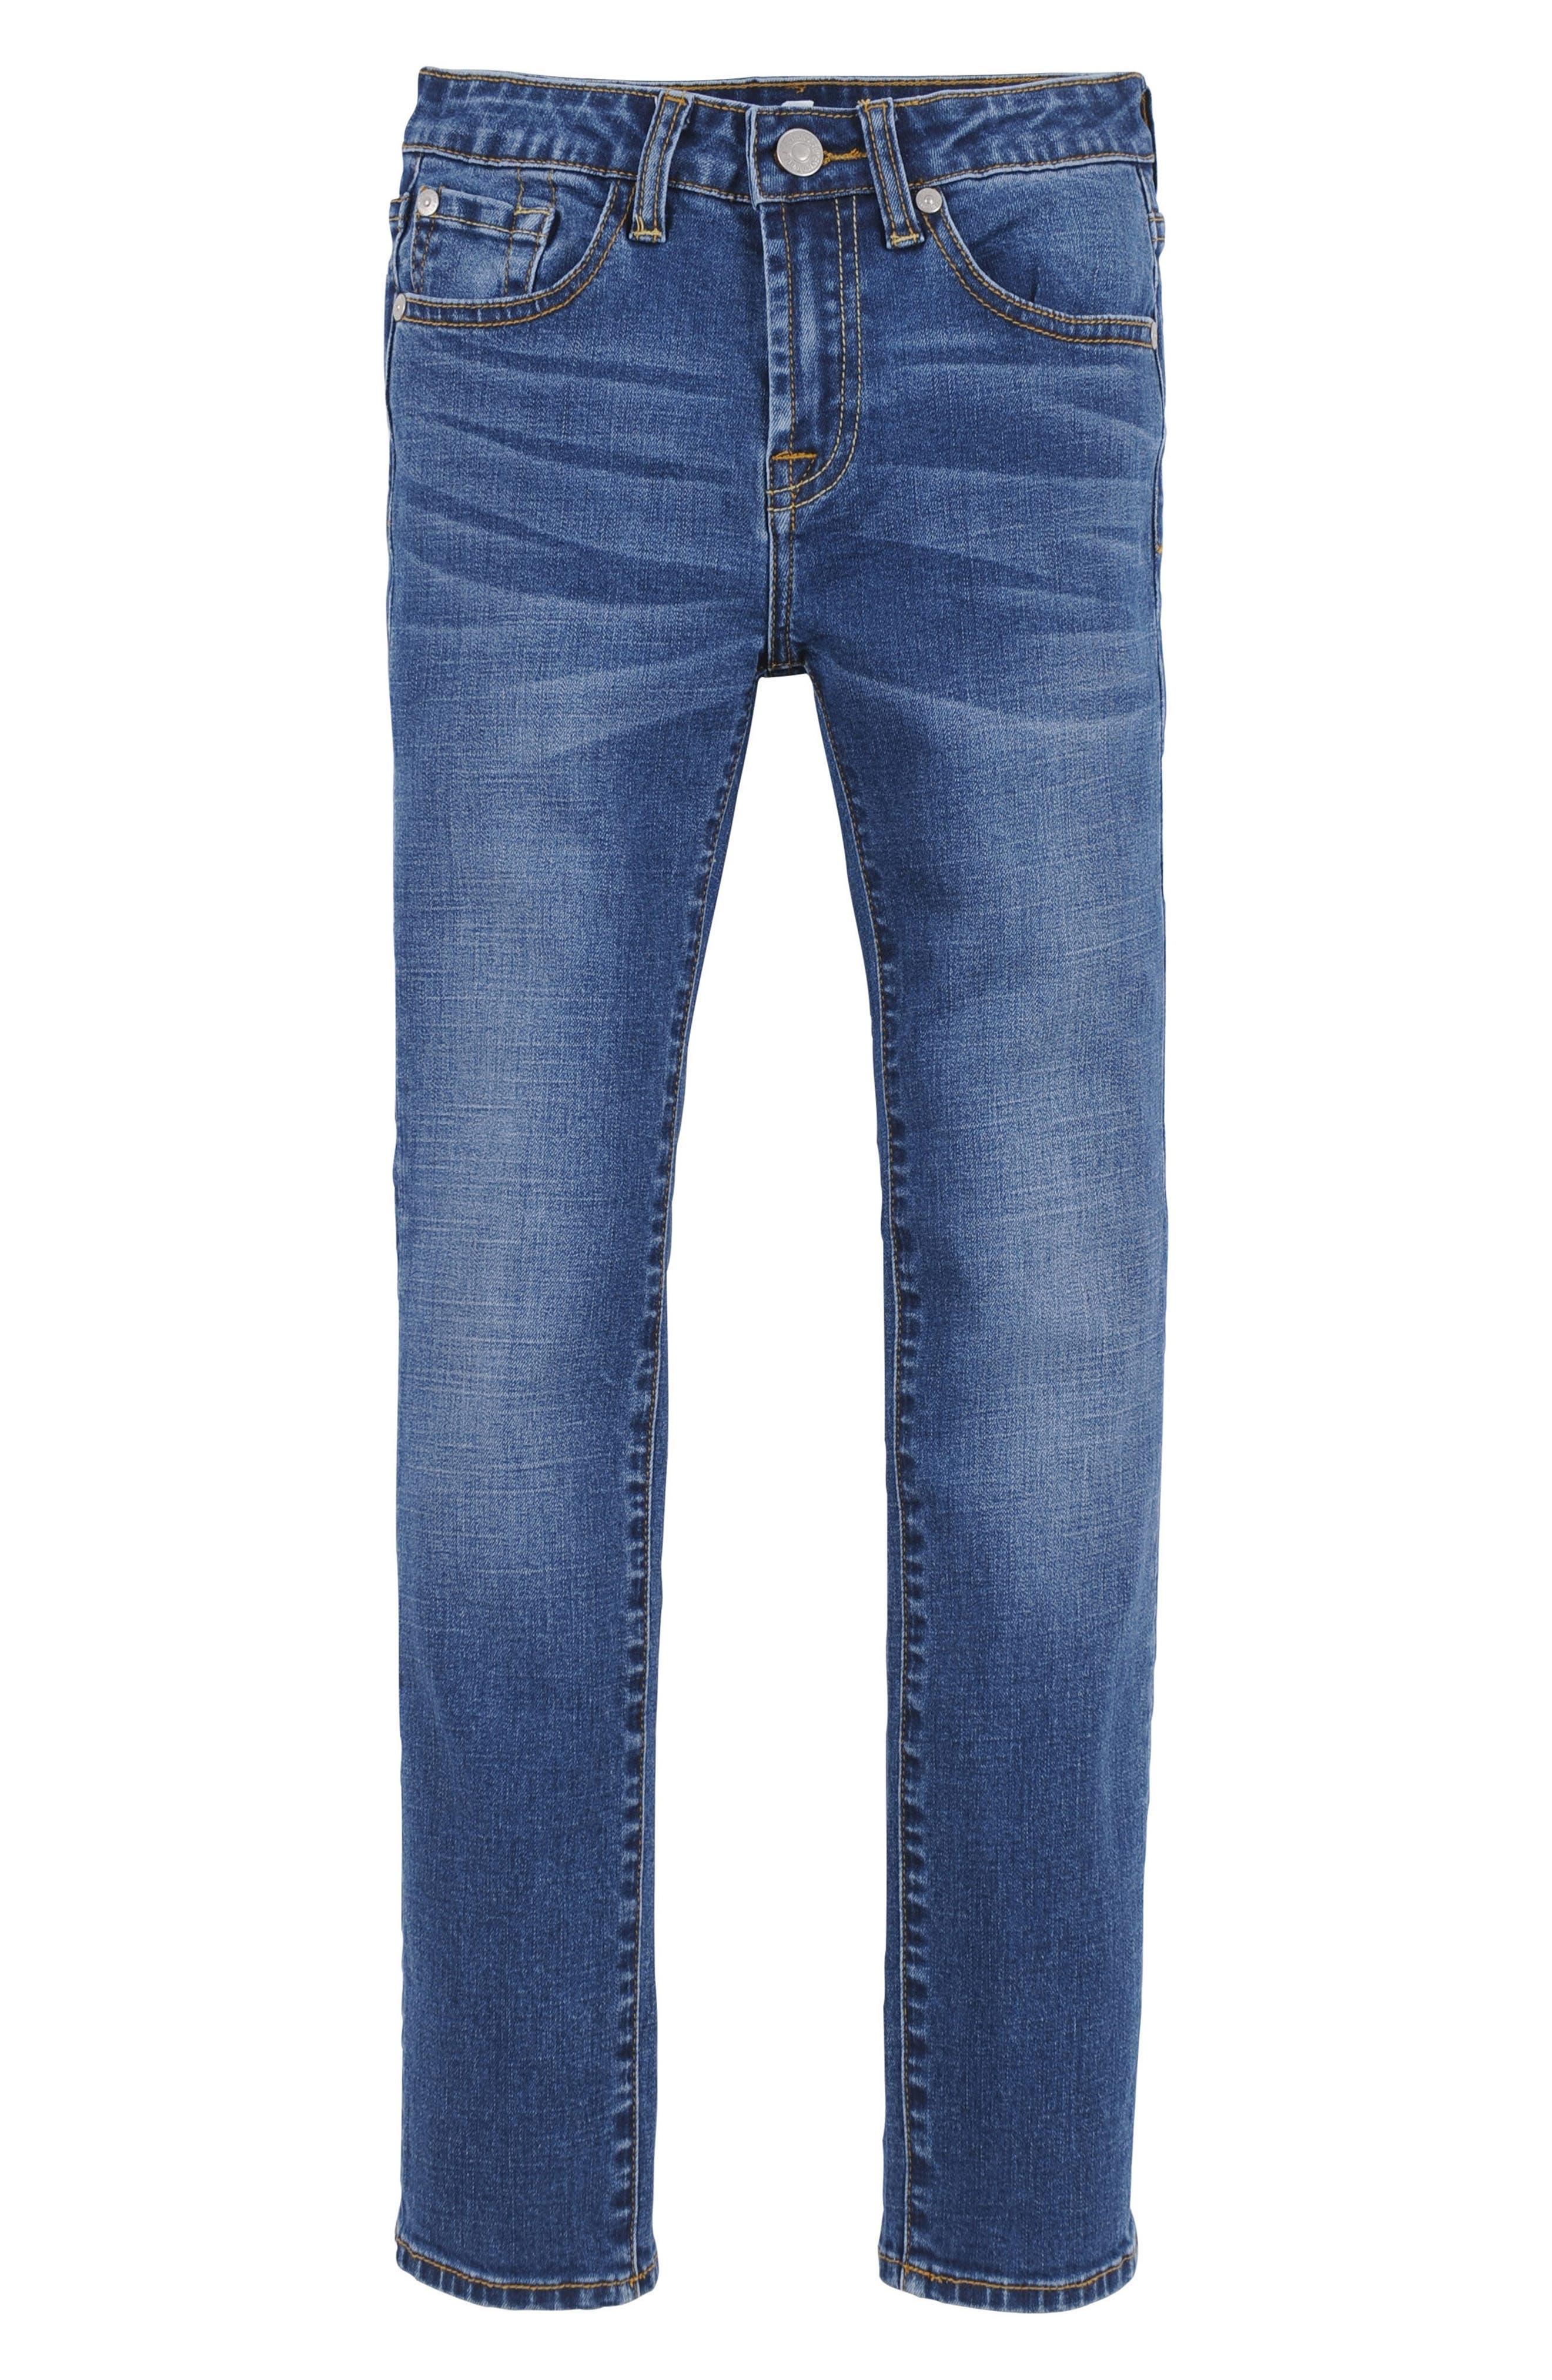 'Slimmy' Jeans,                             Main thumbnail 7, color,